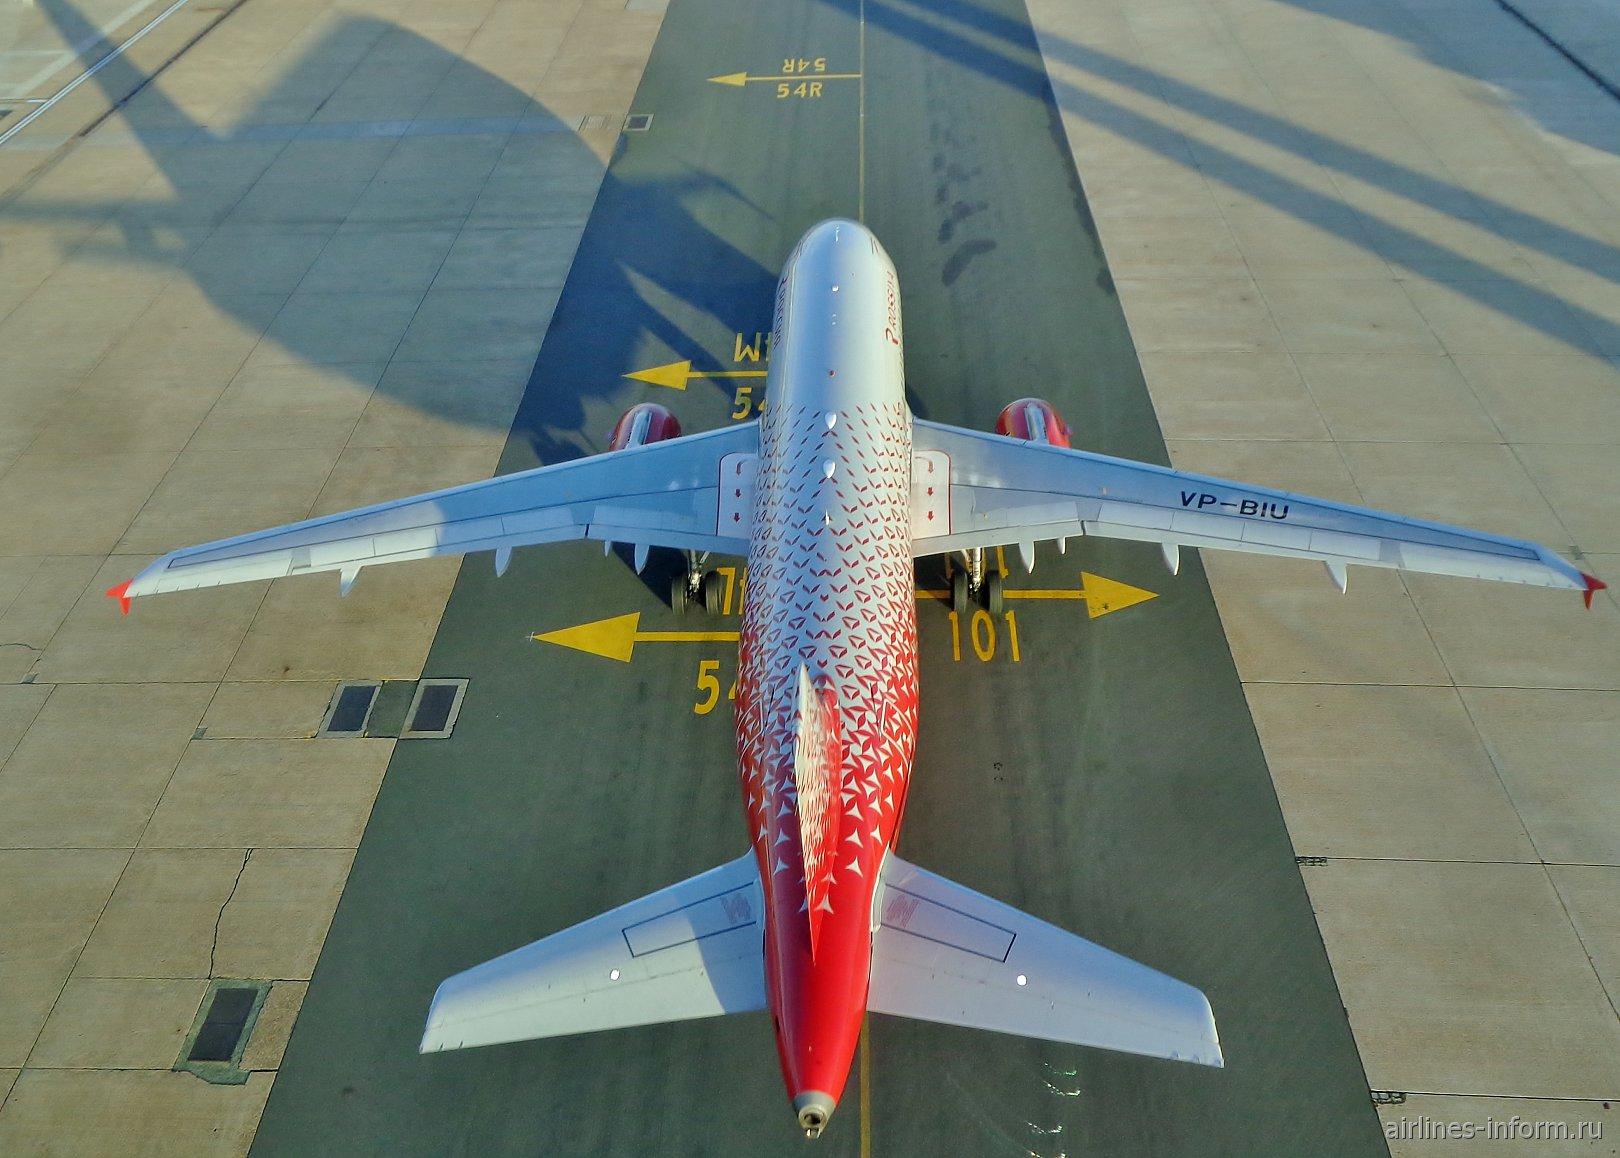 Лондон-Санкт-Петербург (LGW-LED) + Concorde British Airways в Хитроу